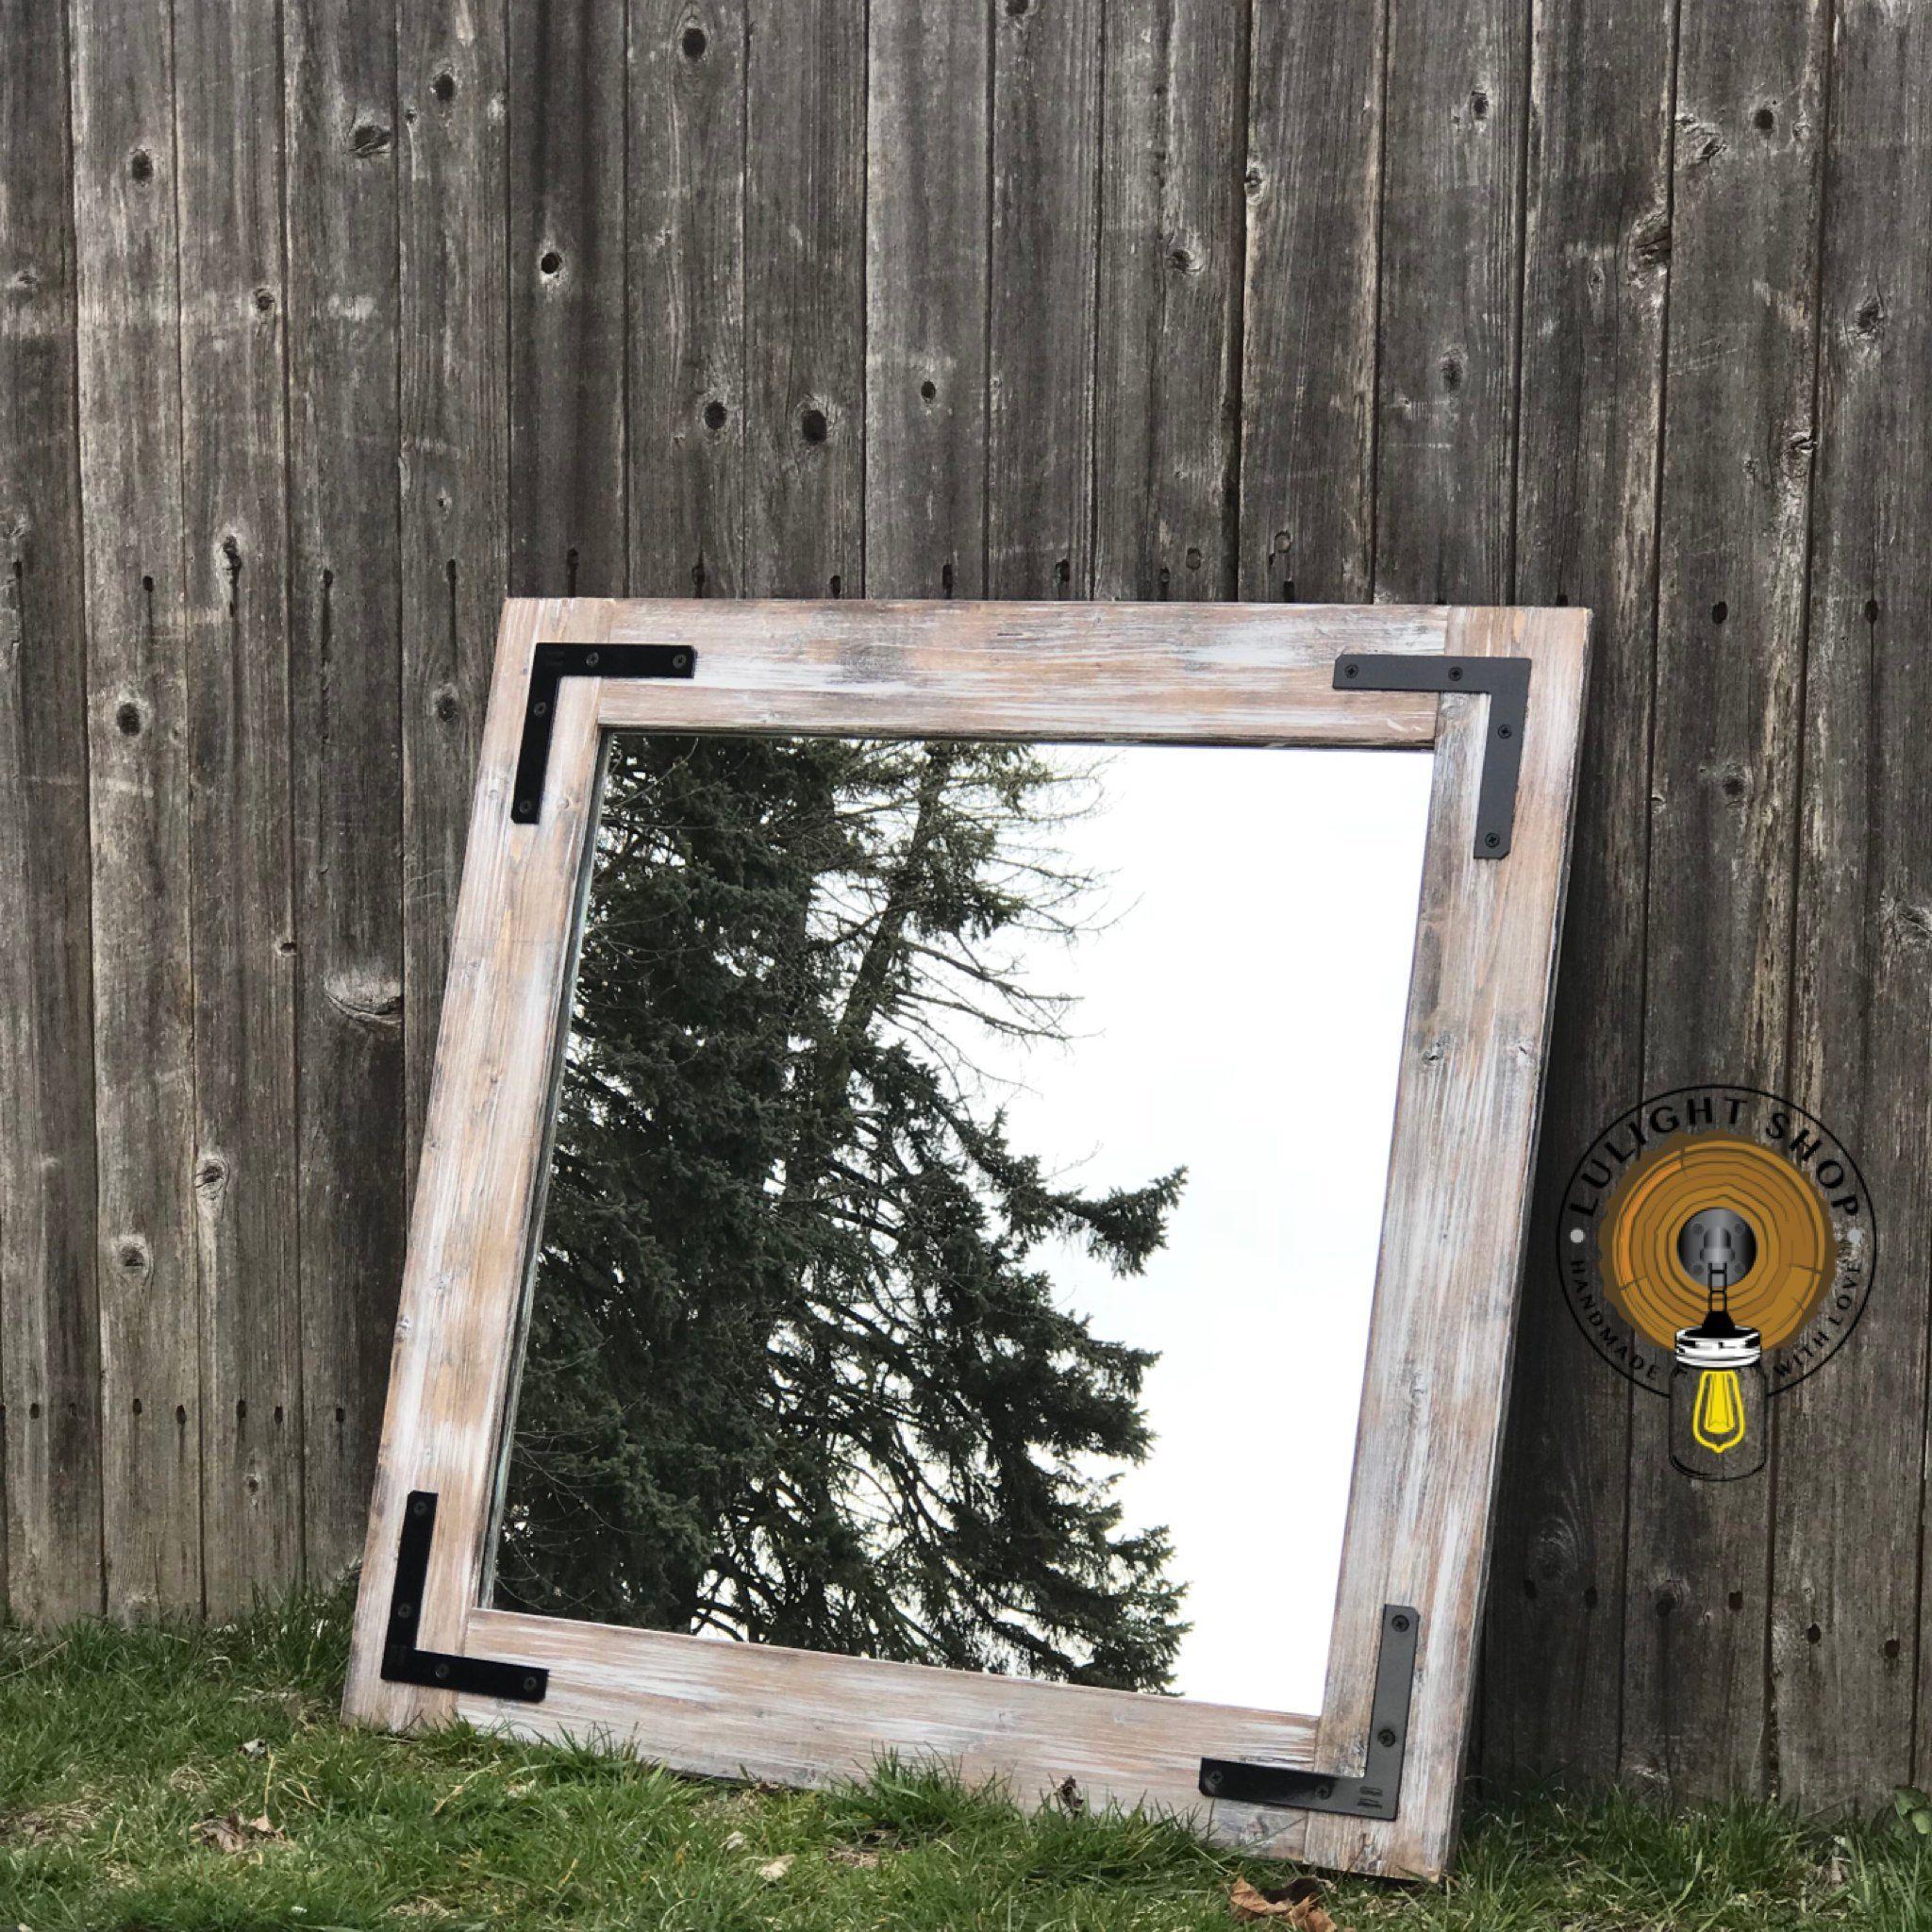 Light Whitewash Farmhouse Mirror Bathroom Wall Mirror Wood Frame Mirror Rustic Wood Mirror Vanity Mirror Small Mirror Large Mirror With Images Farmhouse Mirrors Wood Framed Mirror Rustic Mirrors